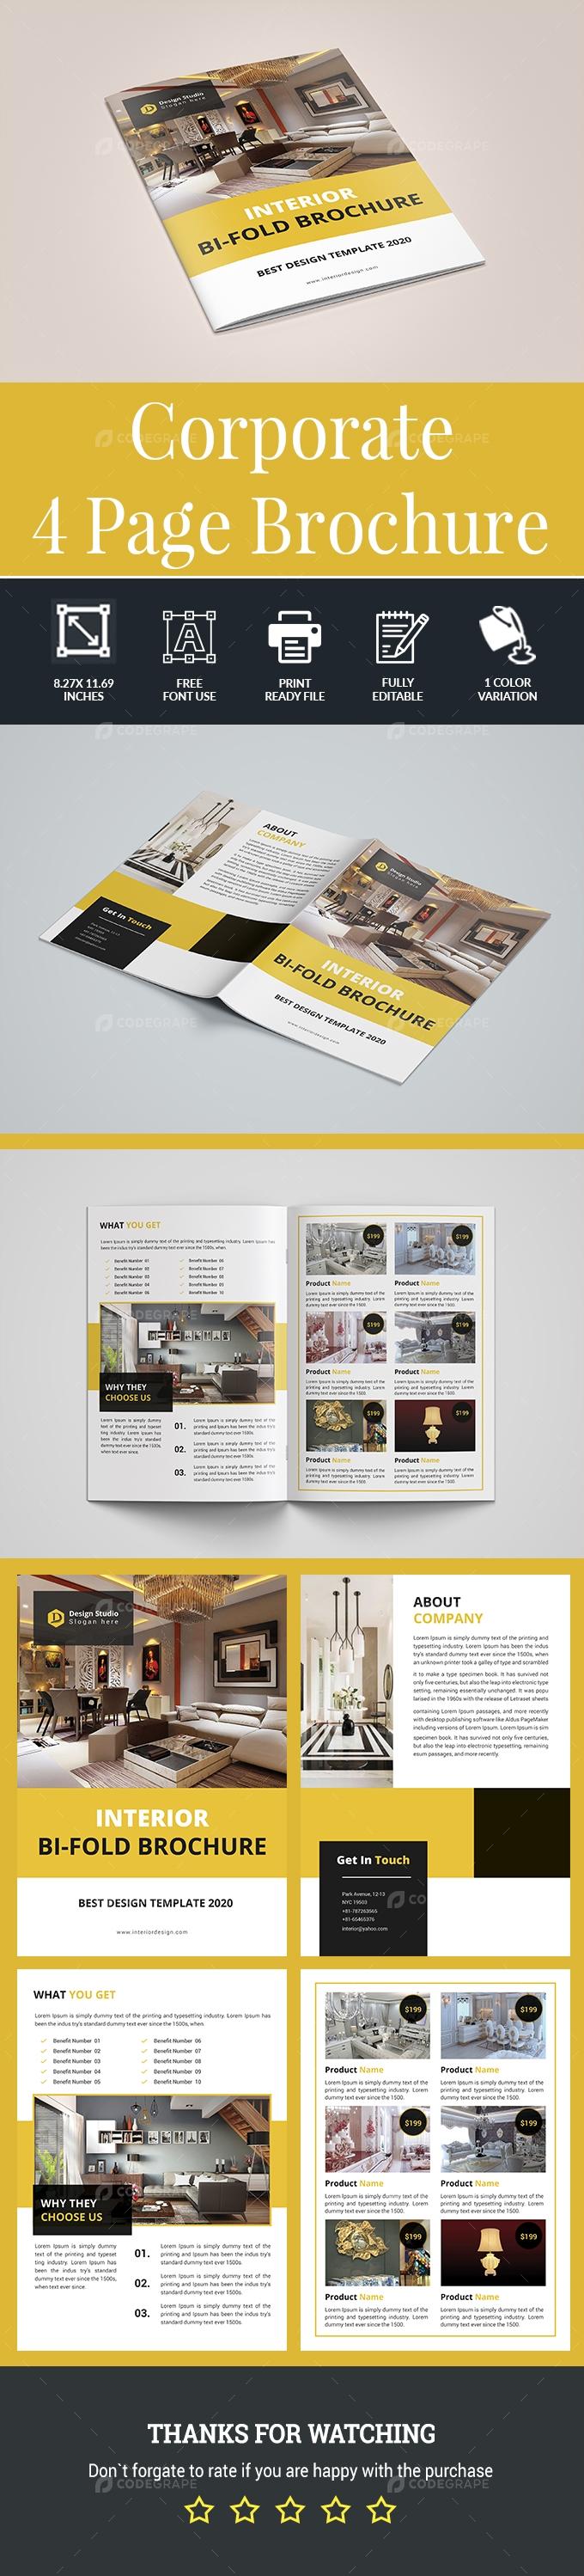 Corporate Bifold Brochure